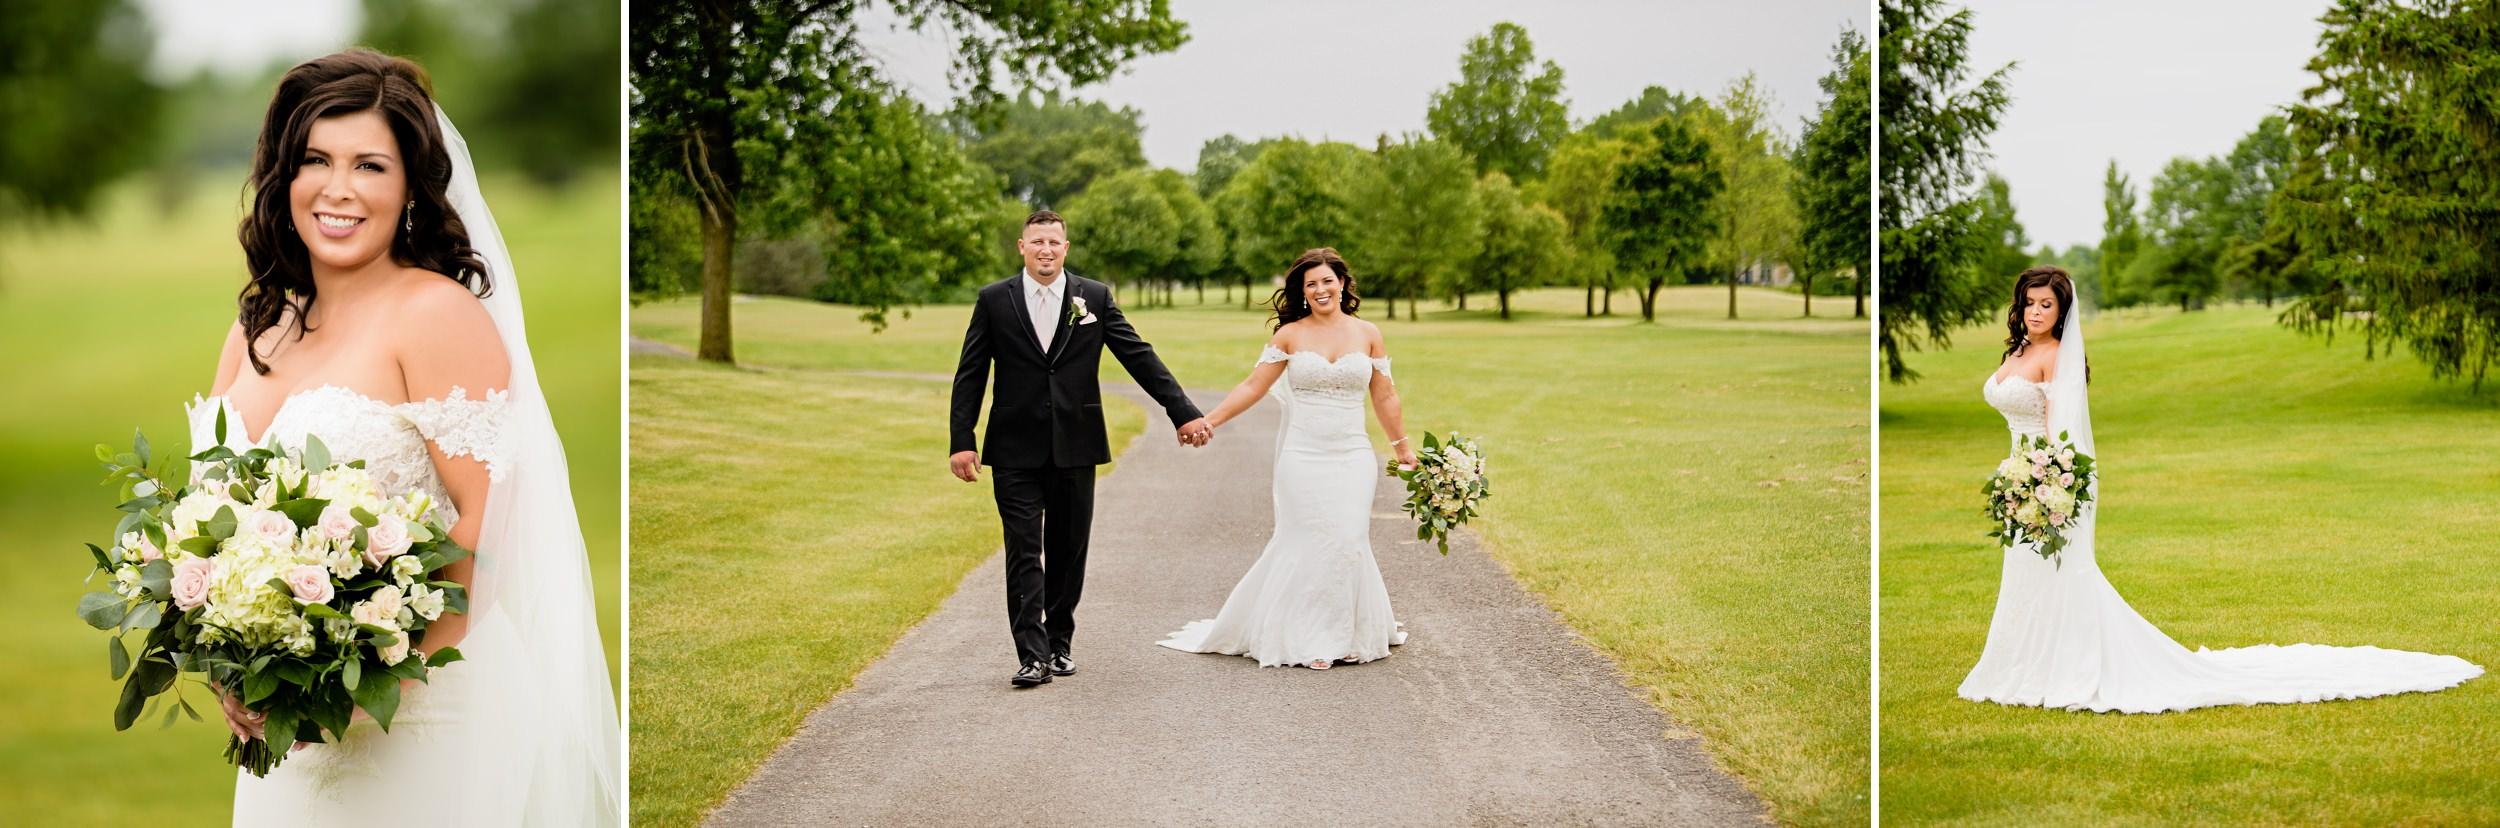 Wedding photos on the golf course of Briar Ridge.